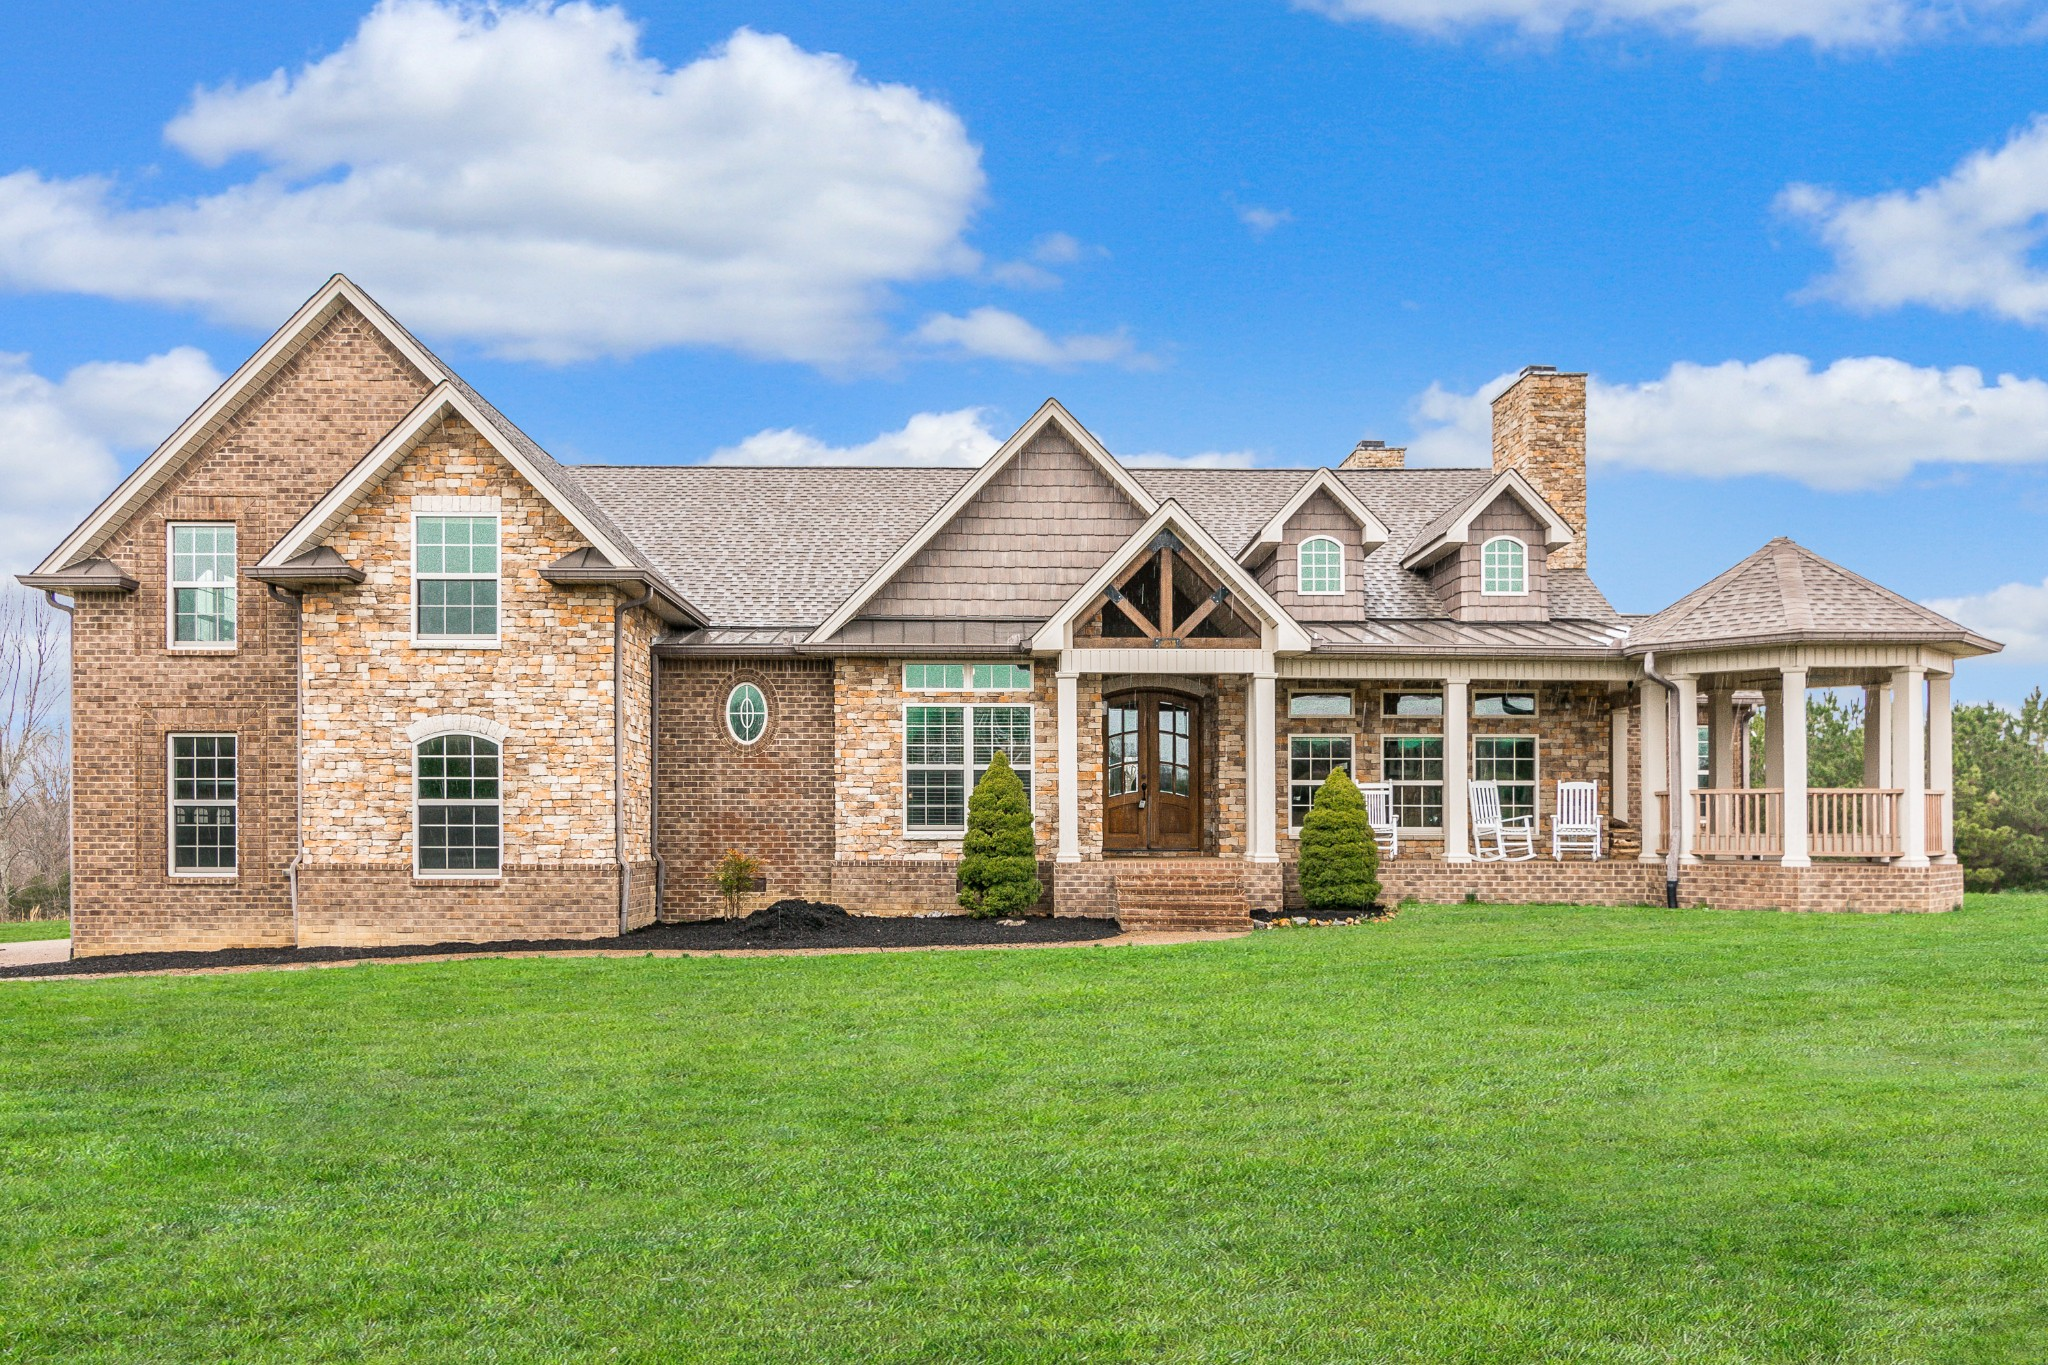 475 Gregory Rd, Westmoreland, TN 37186 - Westmoreland, TN real estate listing